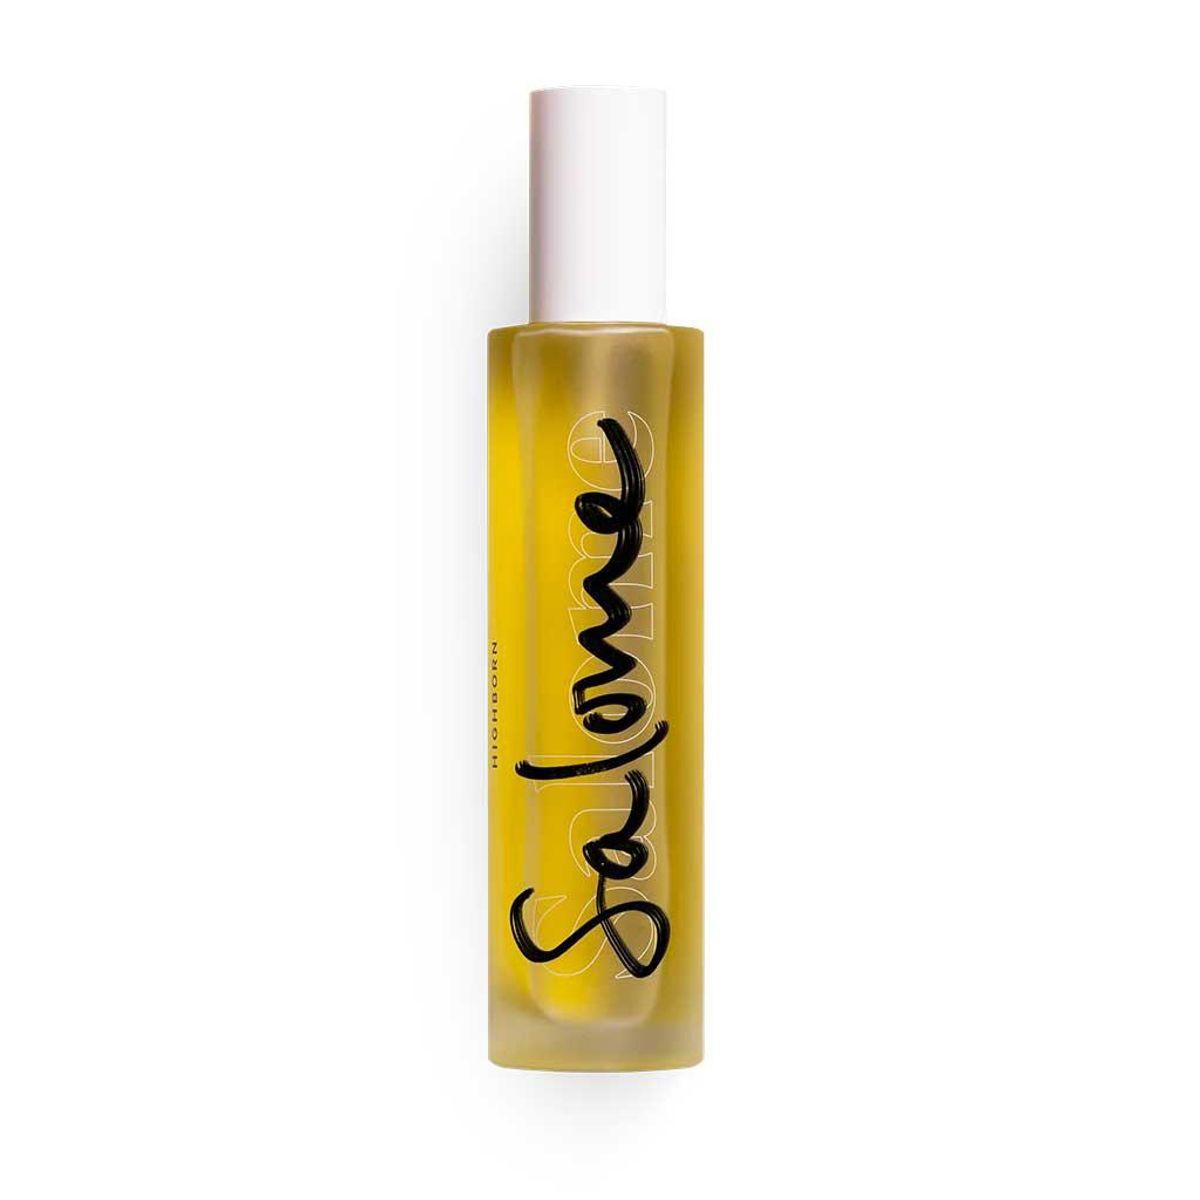 highborn salome aromatic cbd body oil